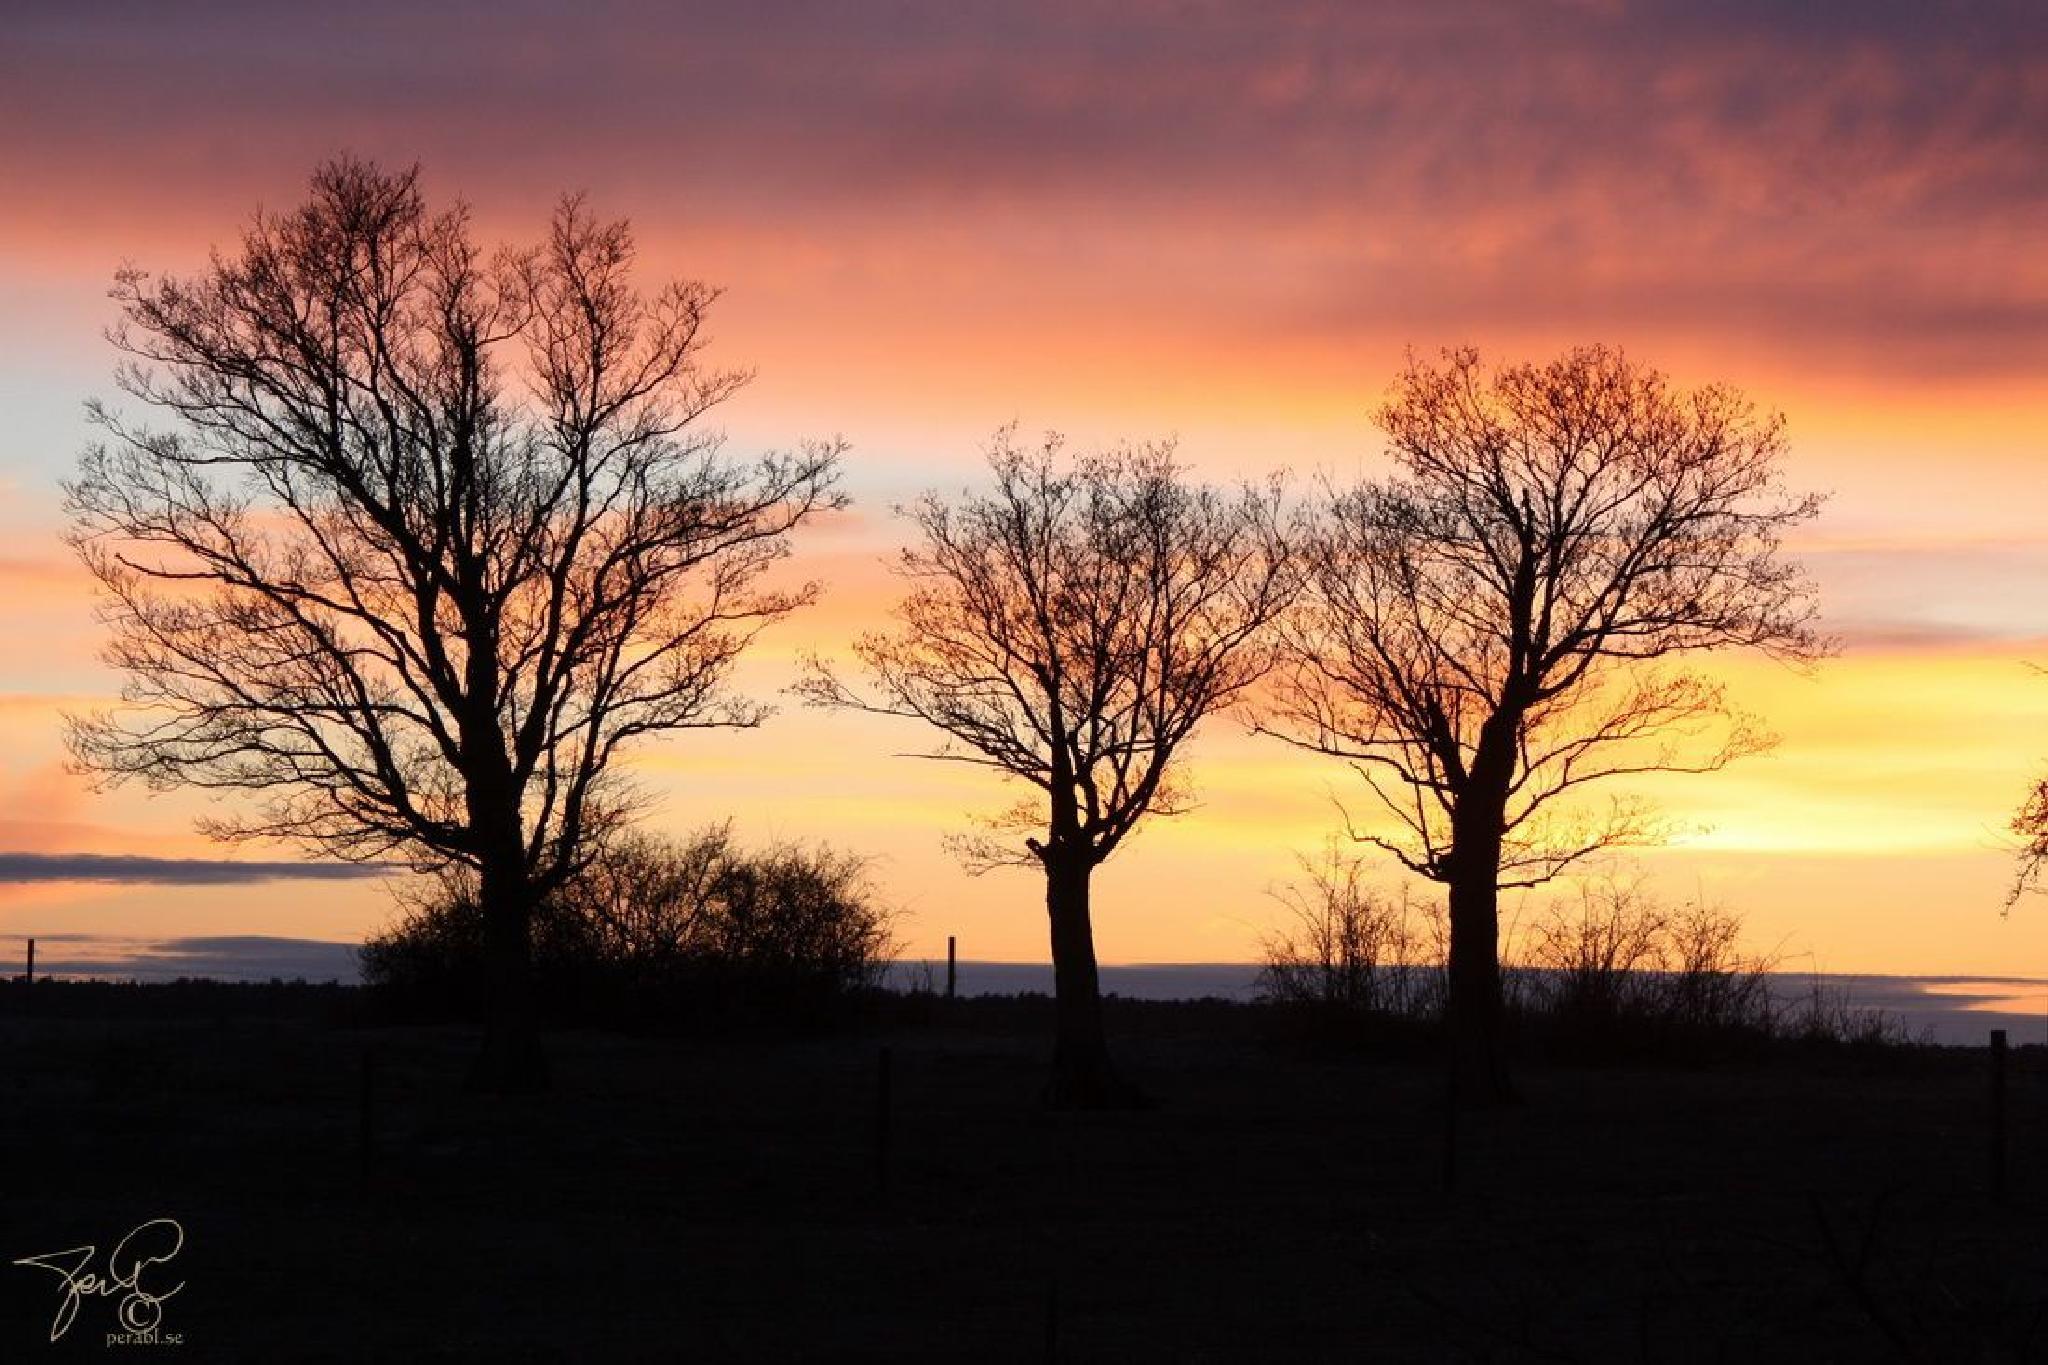 Trees in evening light by Per Lindskog